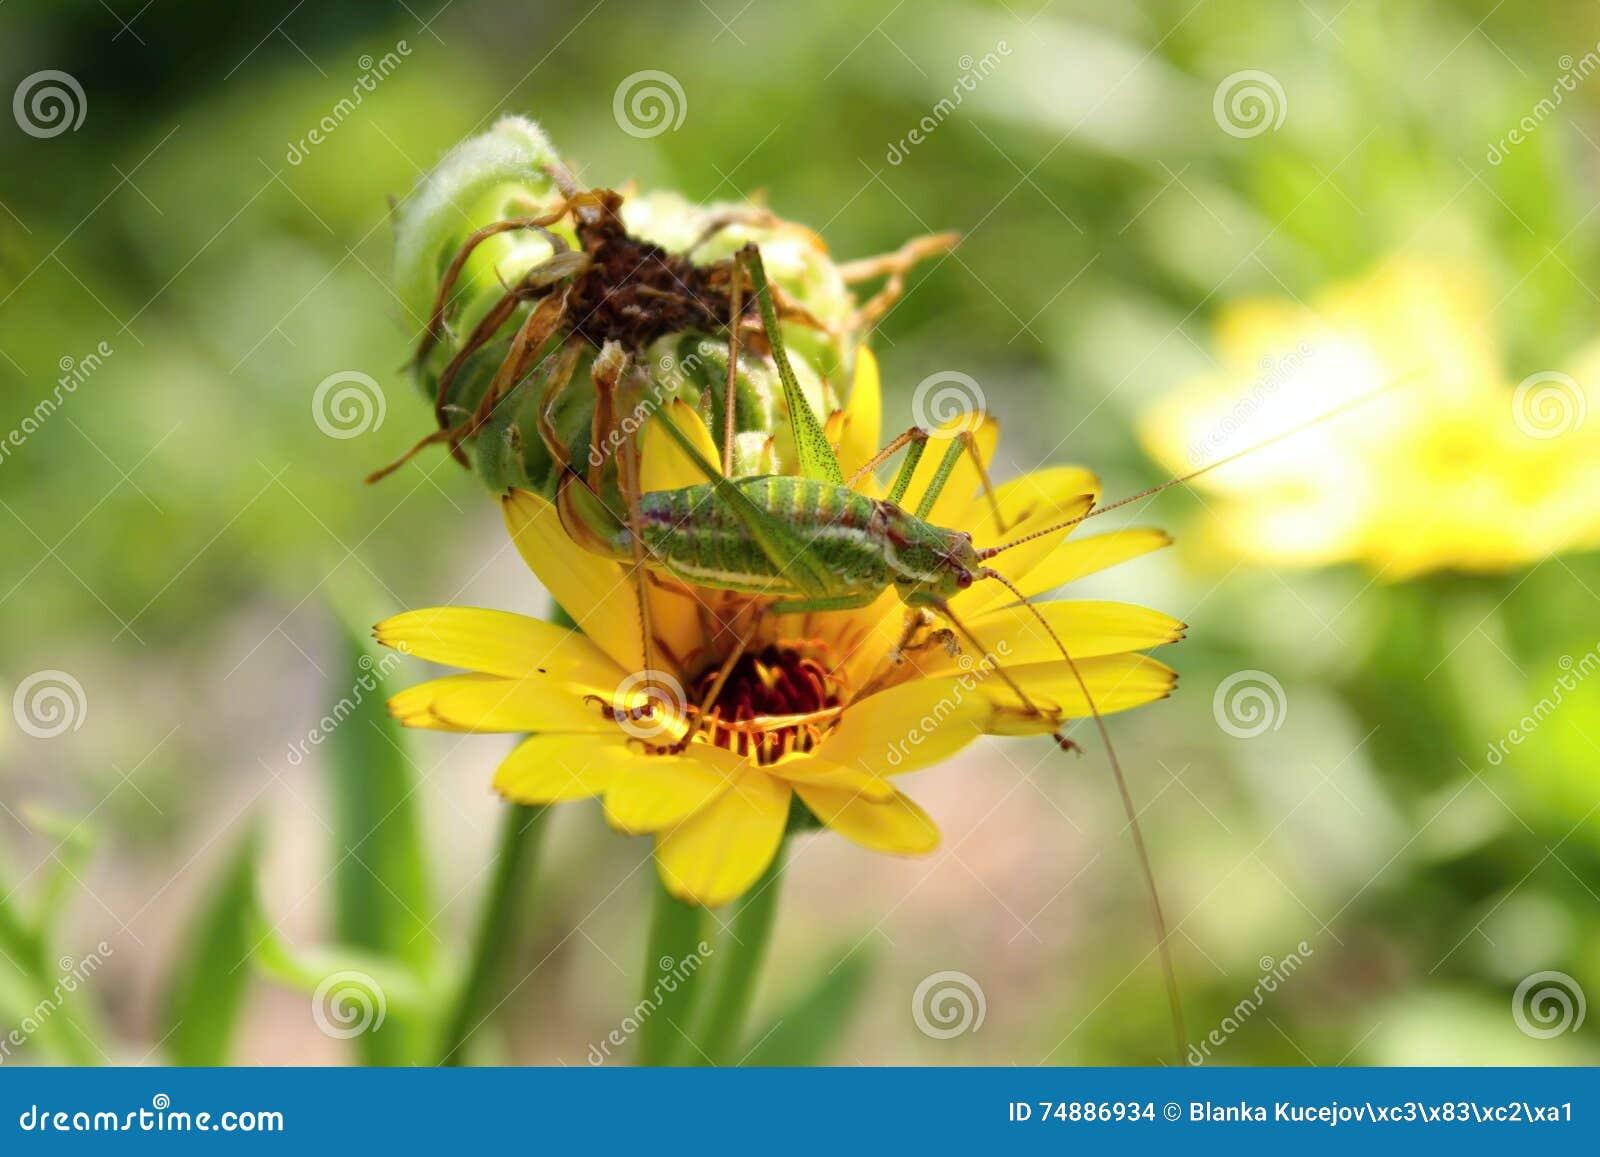 Gafanhoto verde na flor do yeow